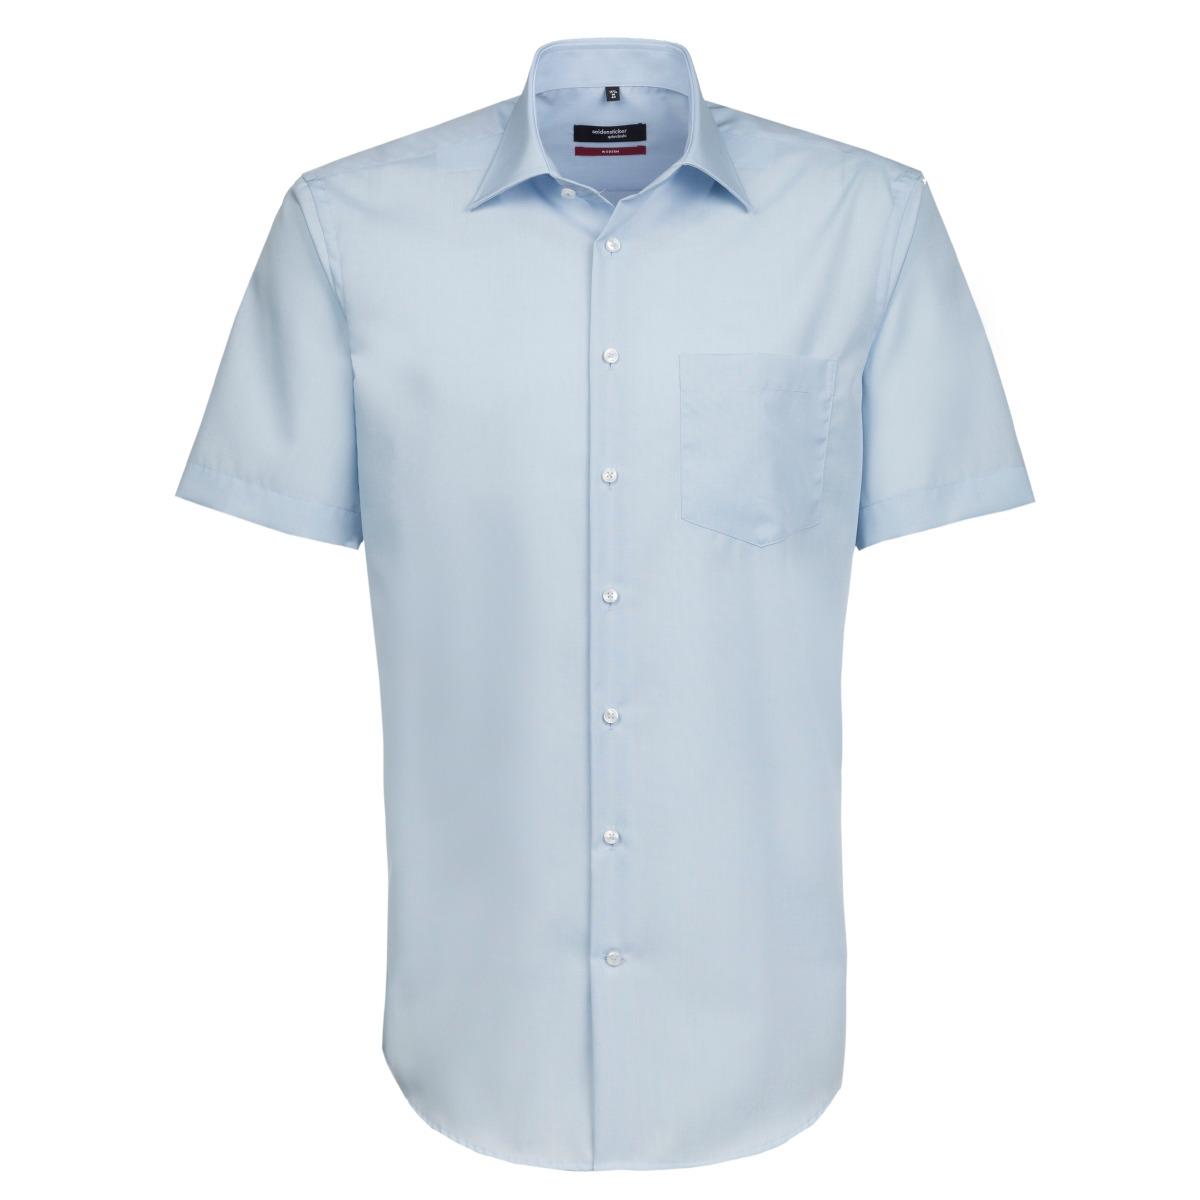 seidensticker-hemd-01-003001-48-hellblau-front